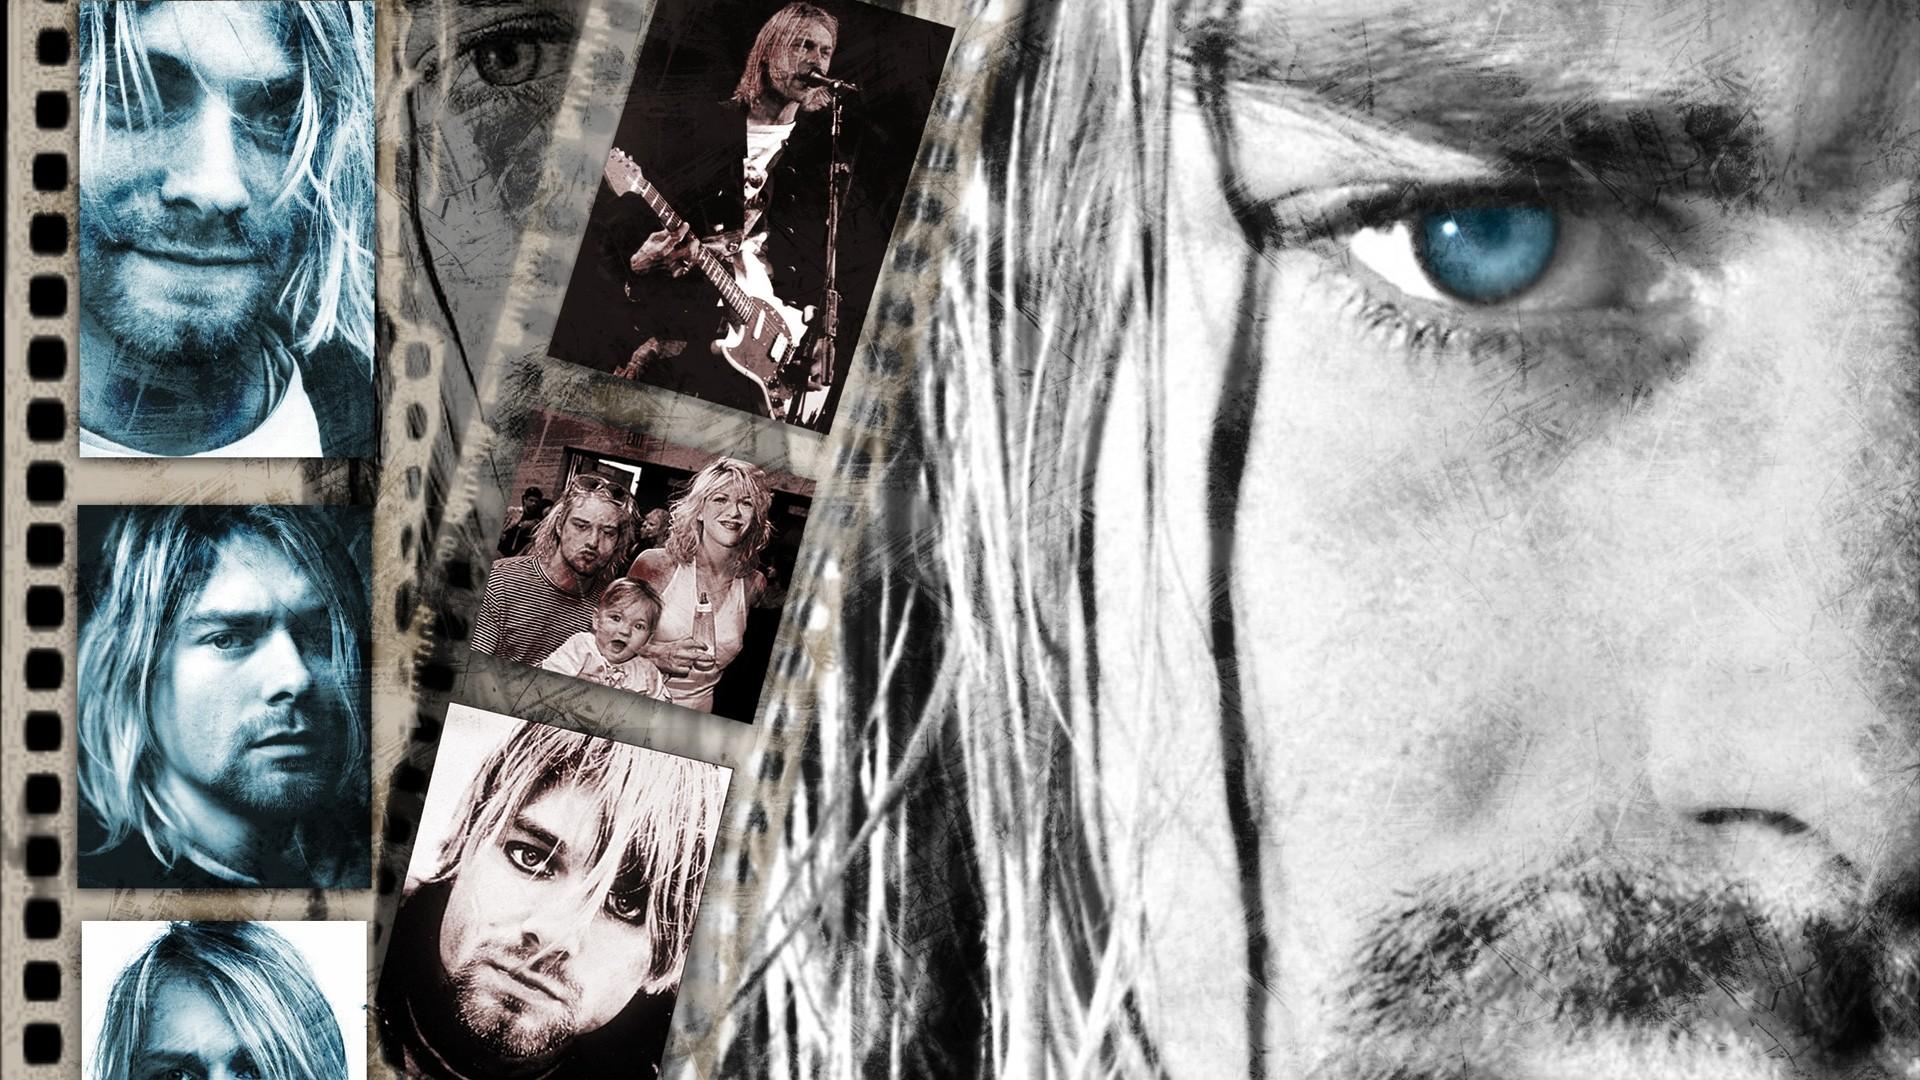 Nirvana wallpaper download free stunning hd wallpapers - Kurt cobain nirvana wallpaper ...